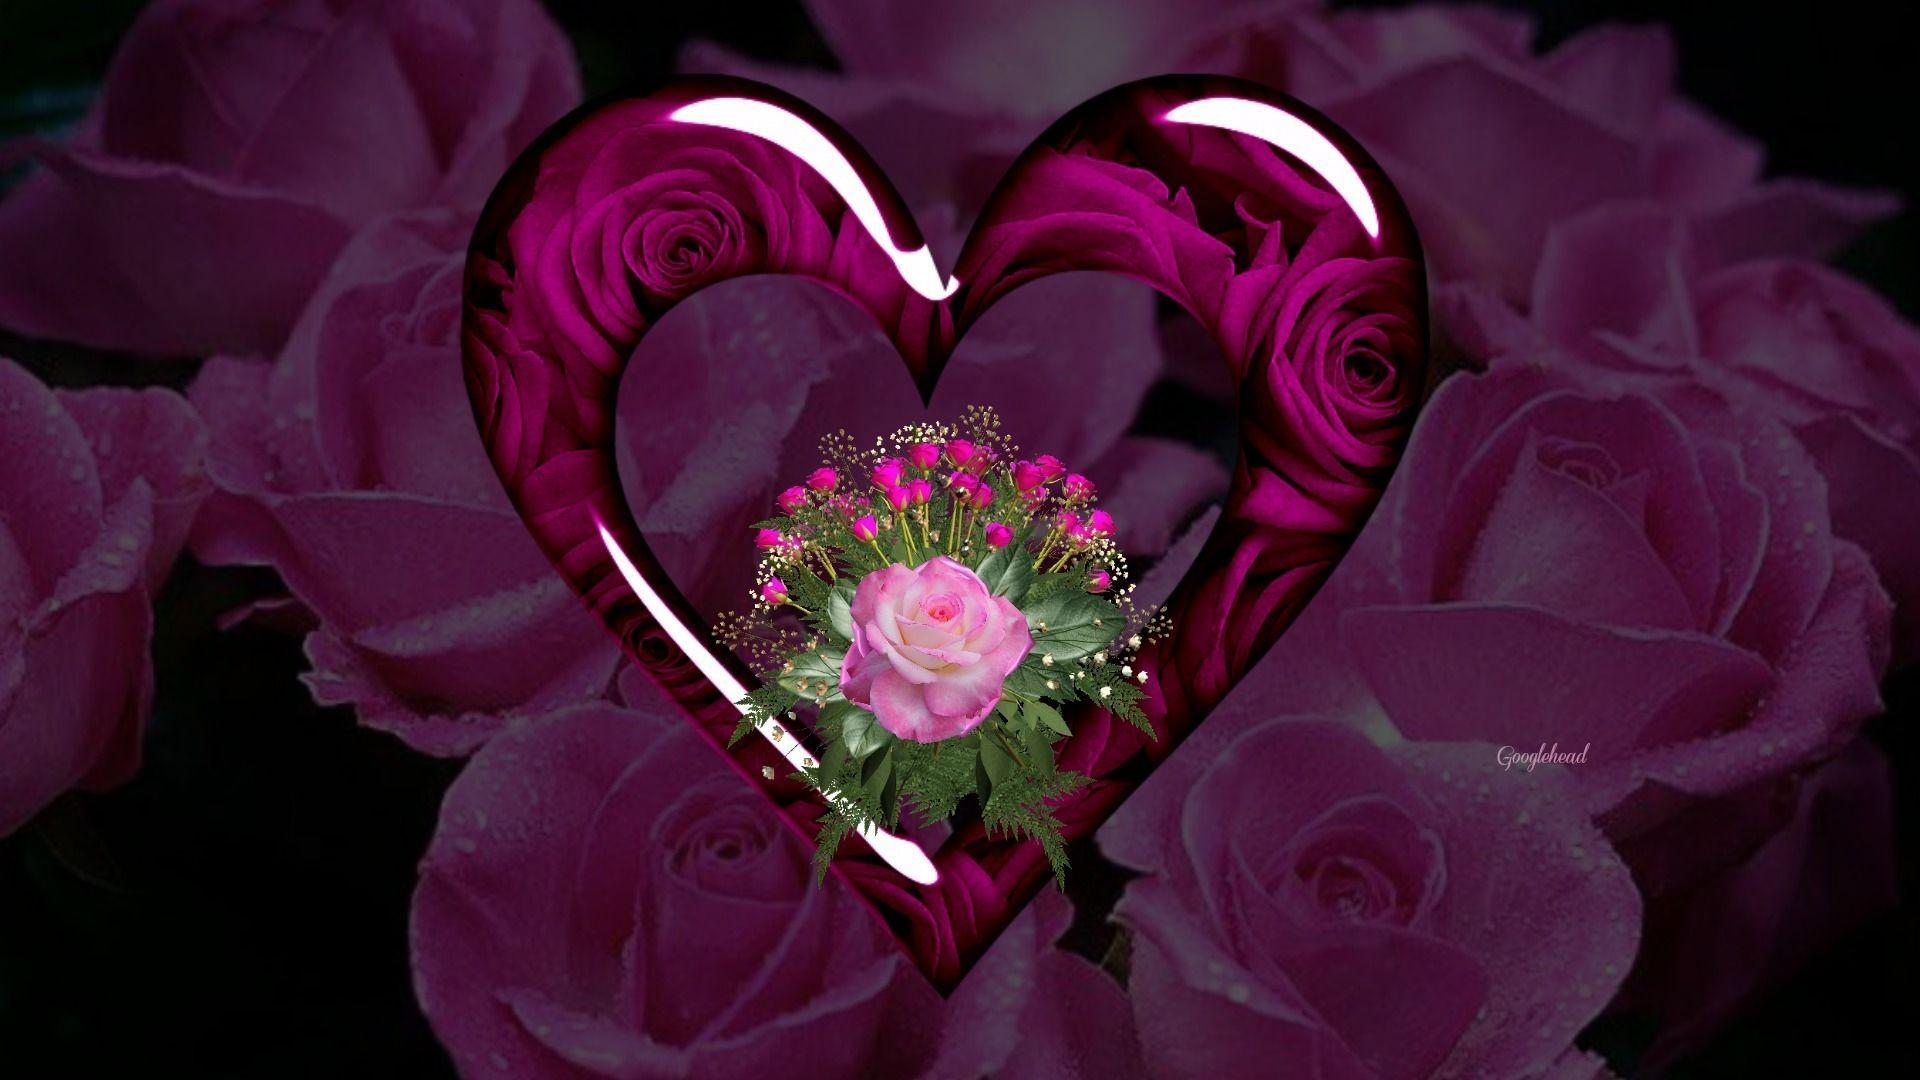 purple hearts and roses   Purple Hearts And Roses Wallpaper Red roses and  hearts wallpapers .